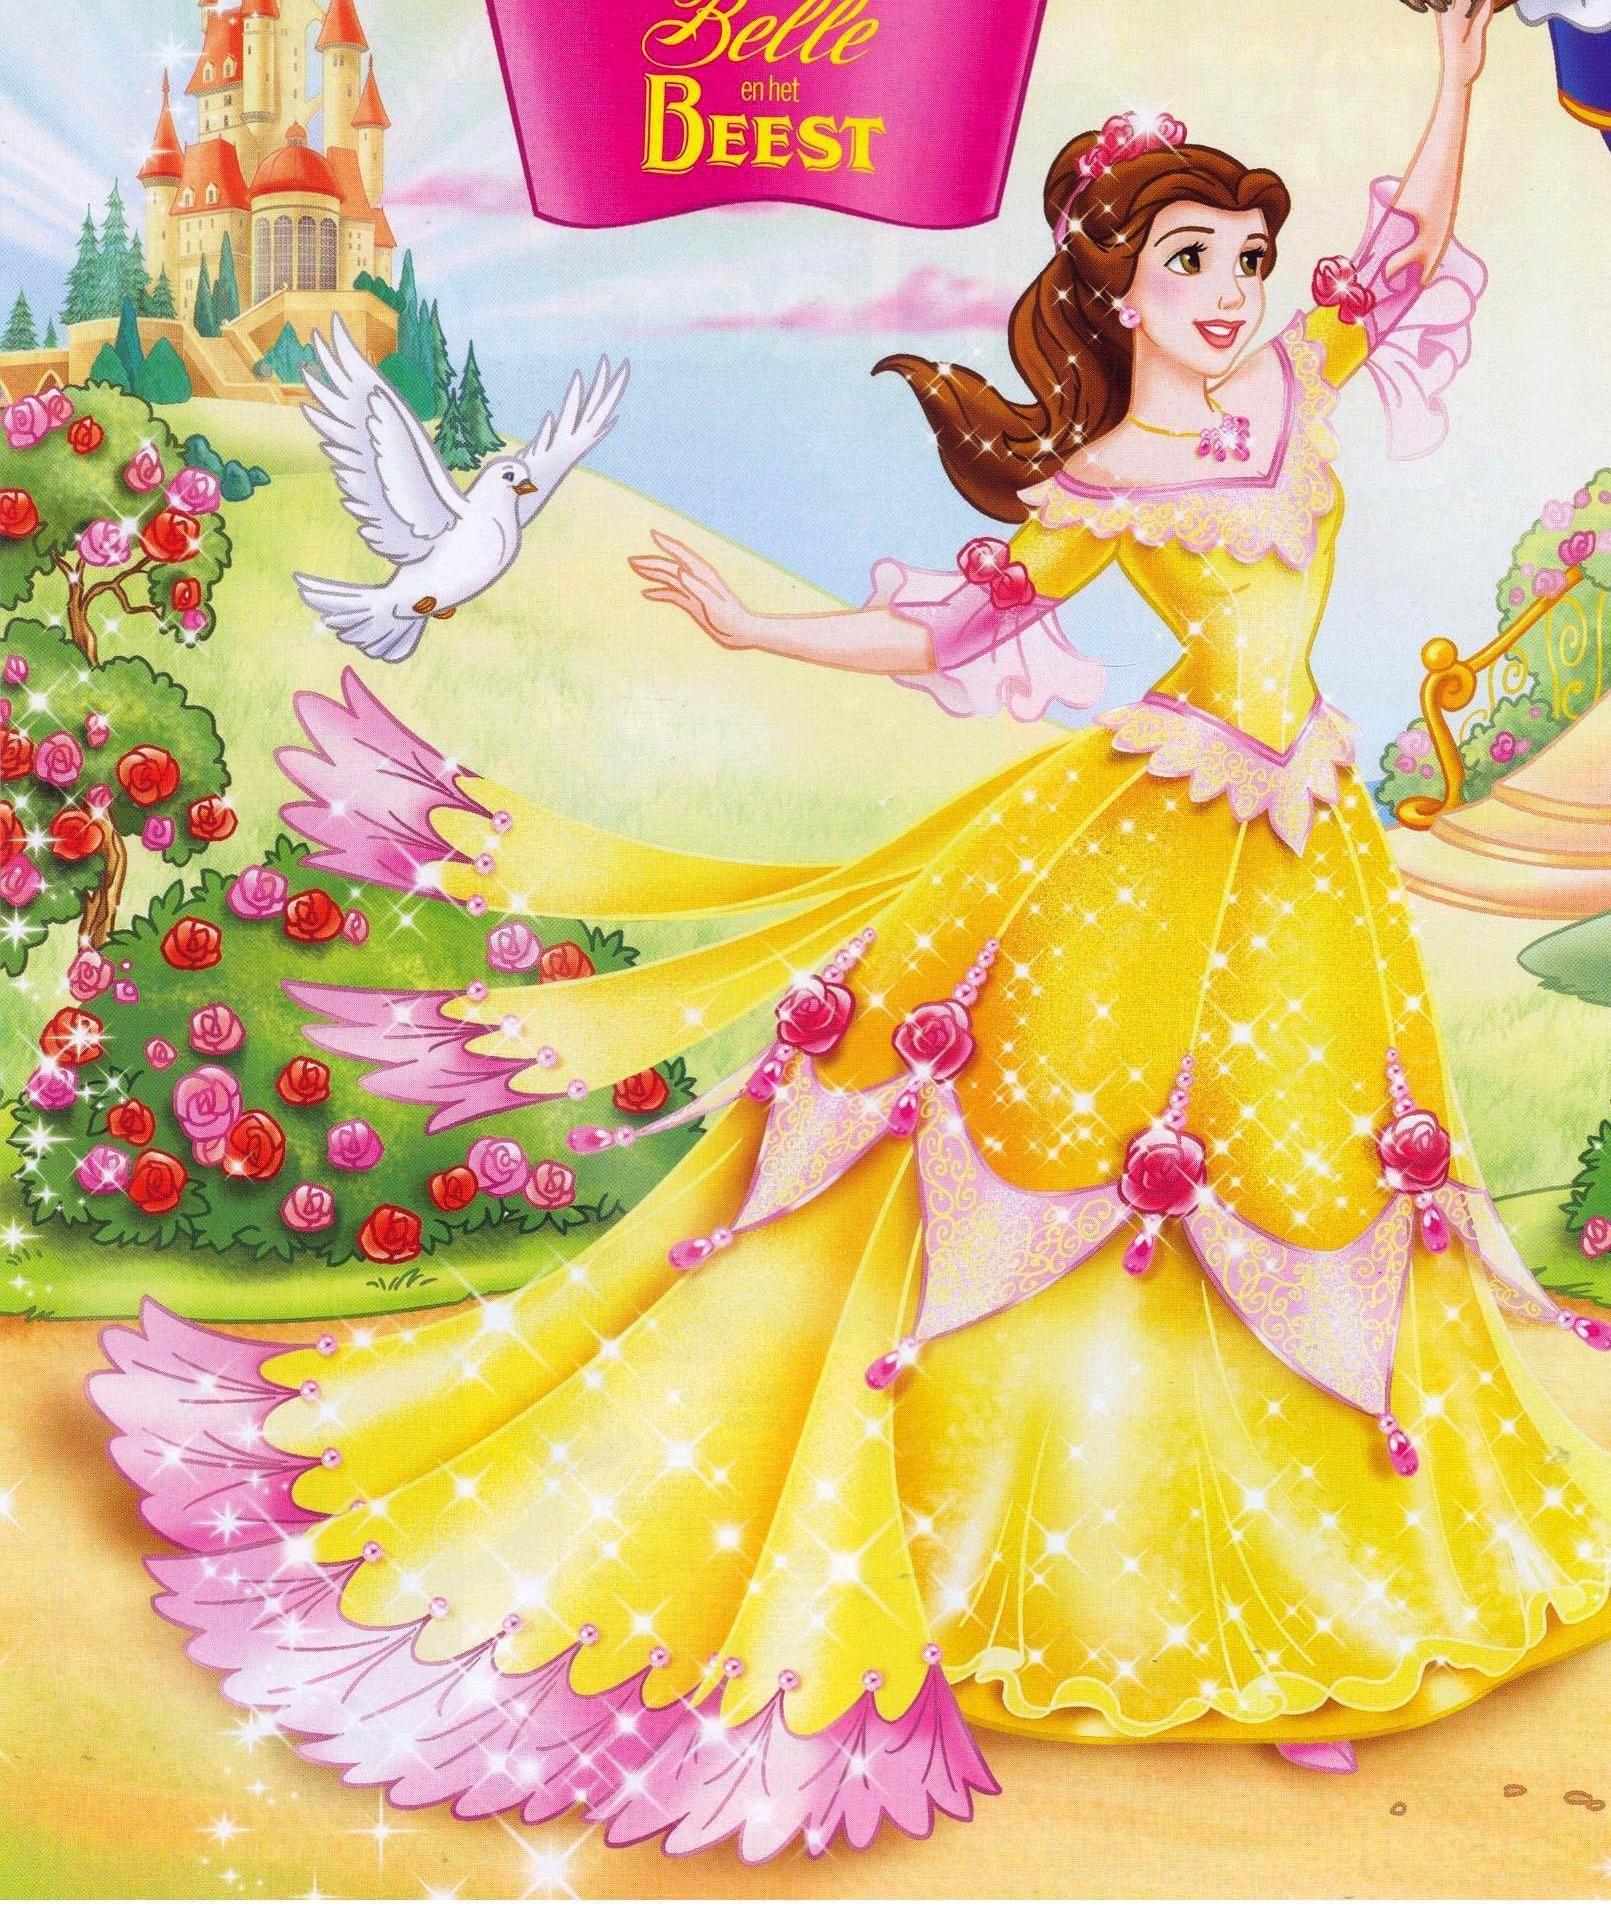 disney princess images princess belle hd wallpaper and background